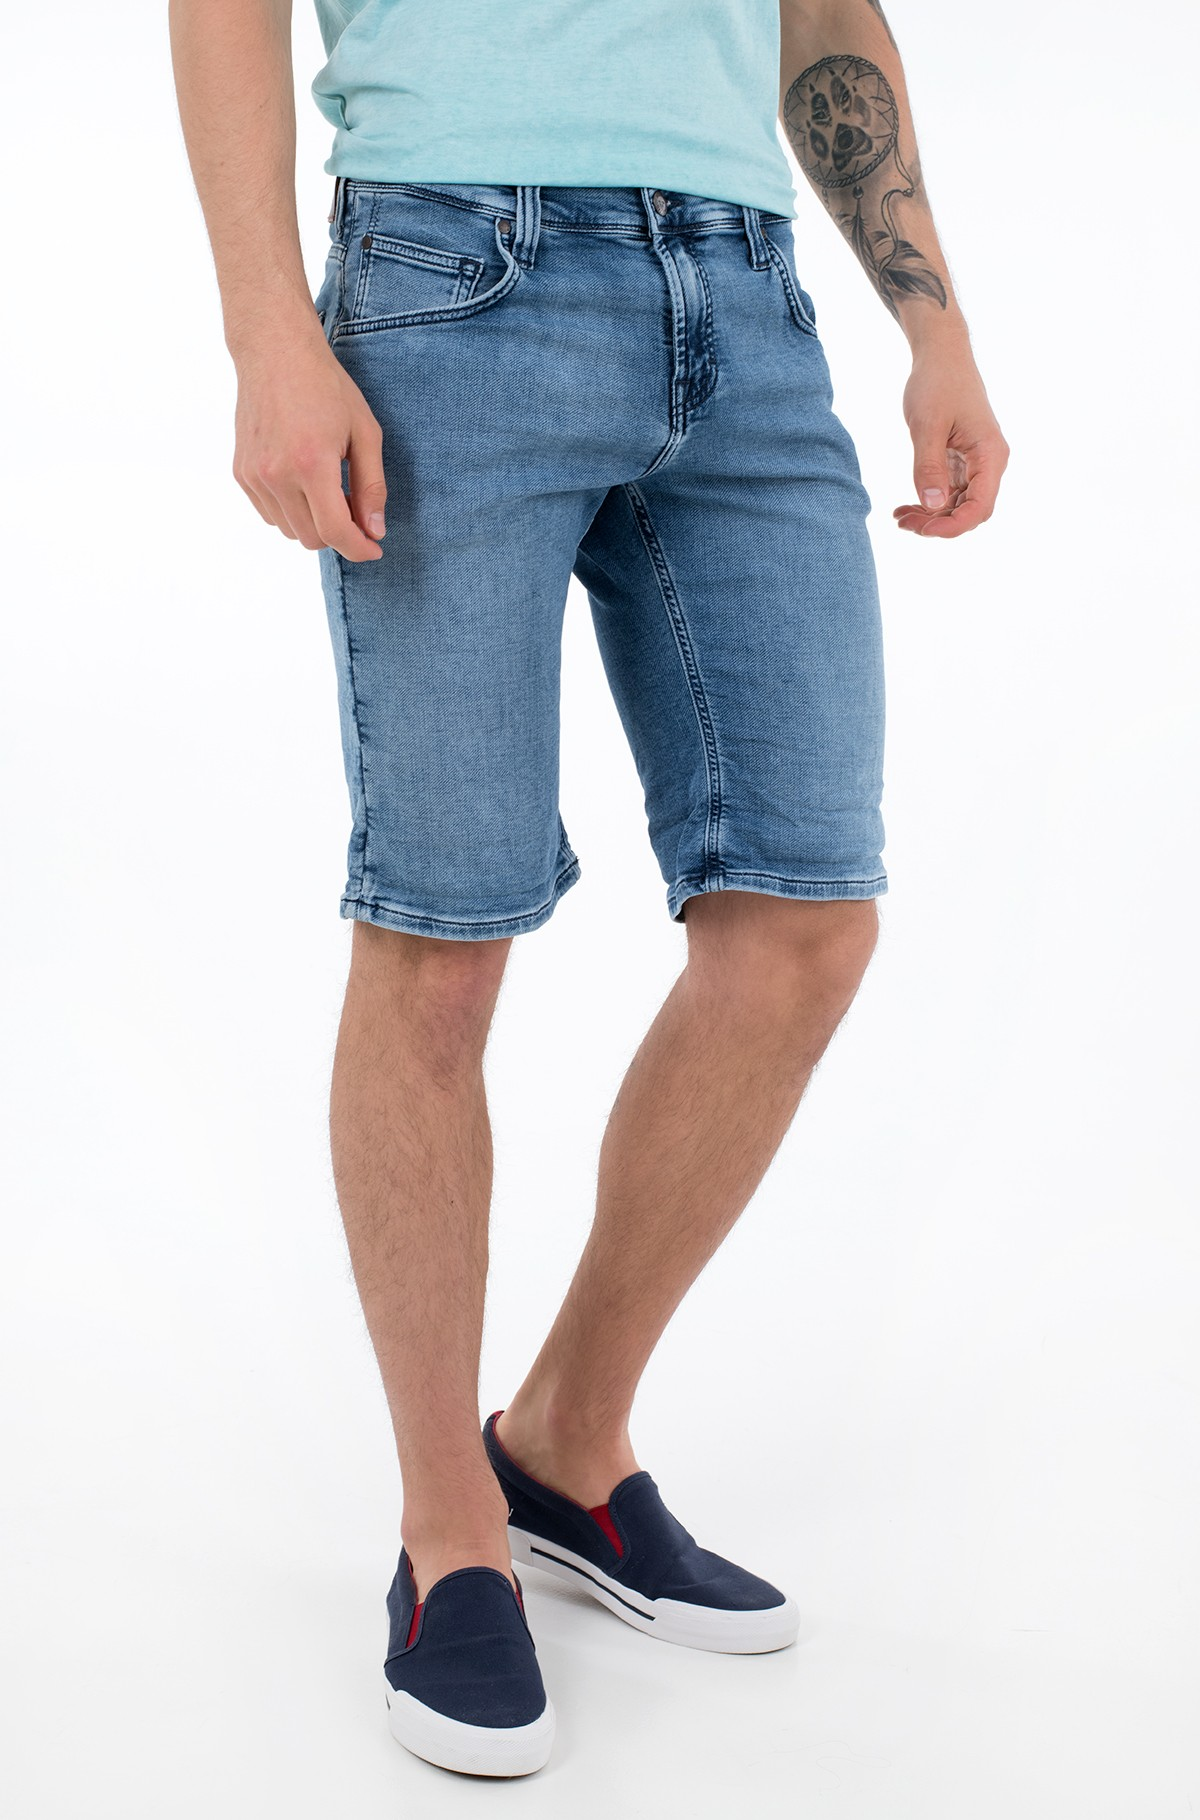 Shorts 101-0873-full-1